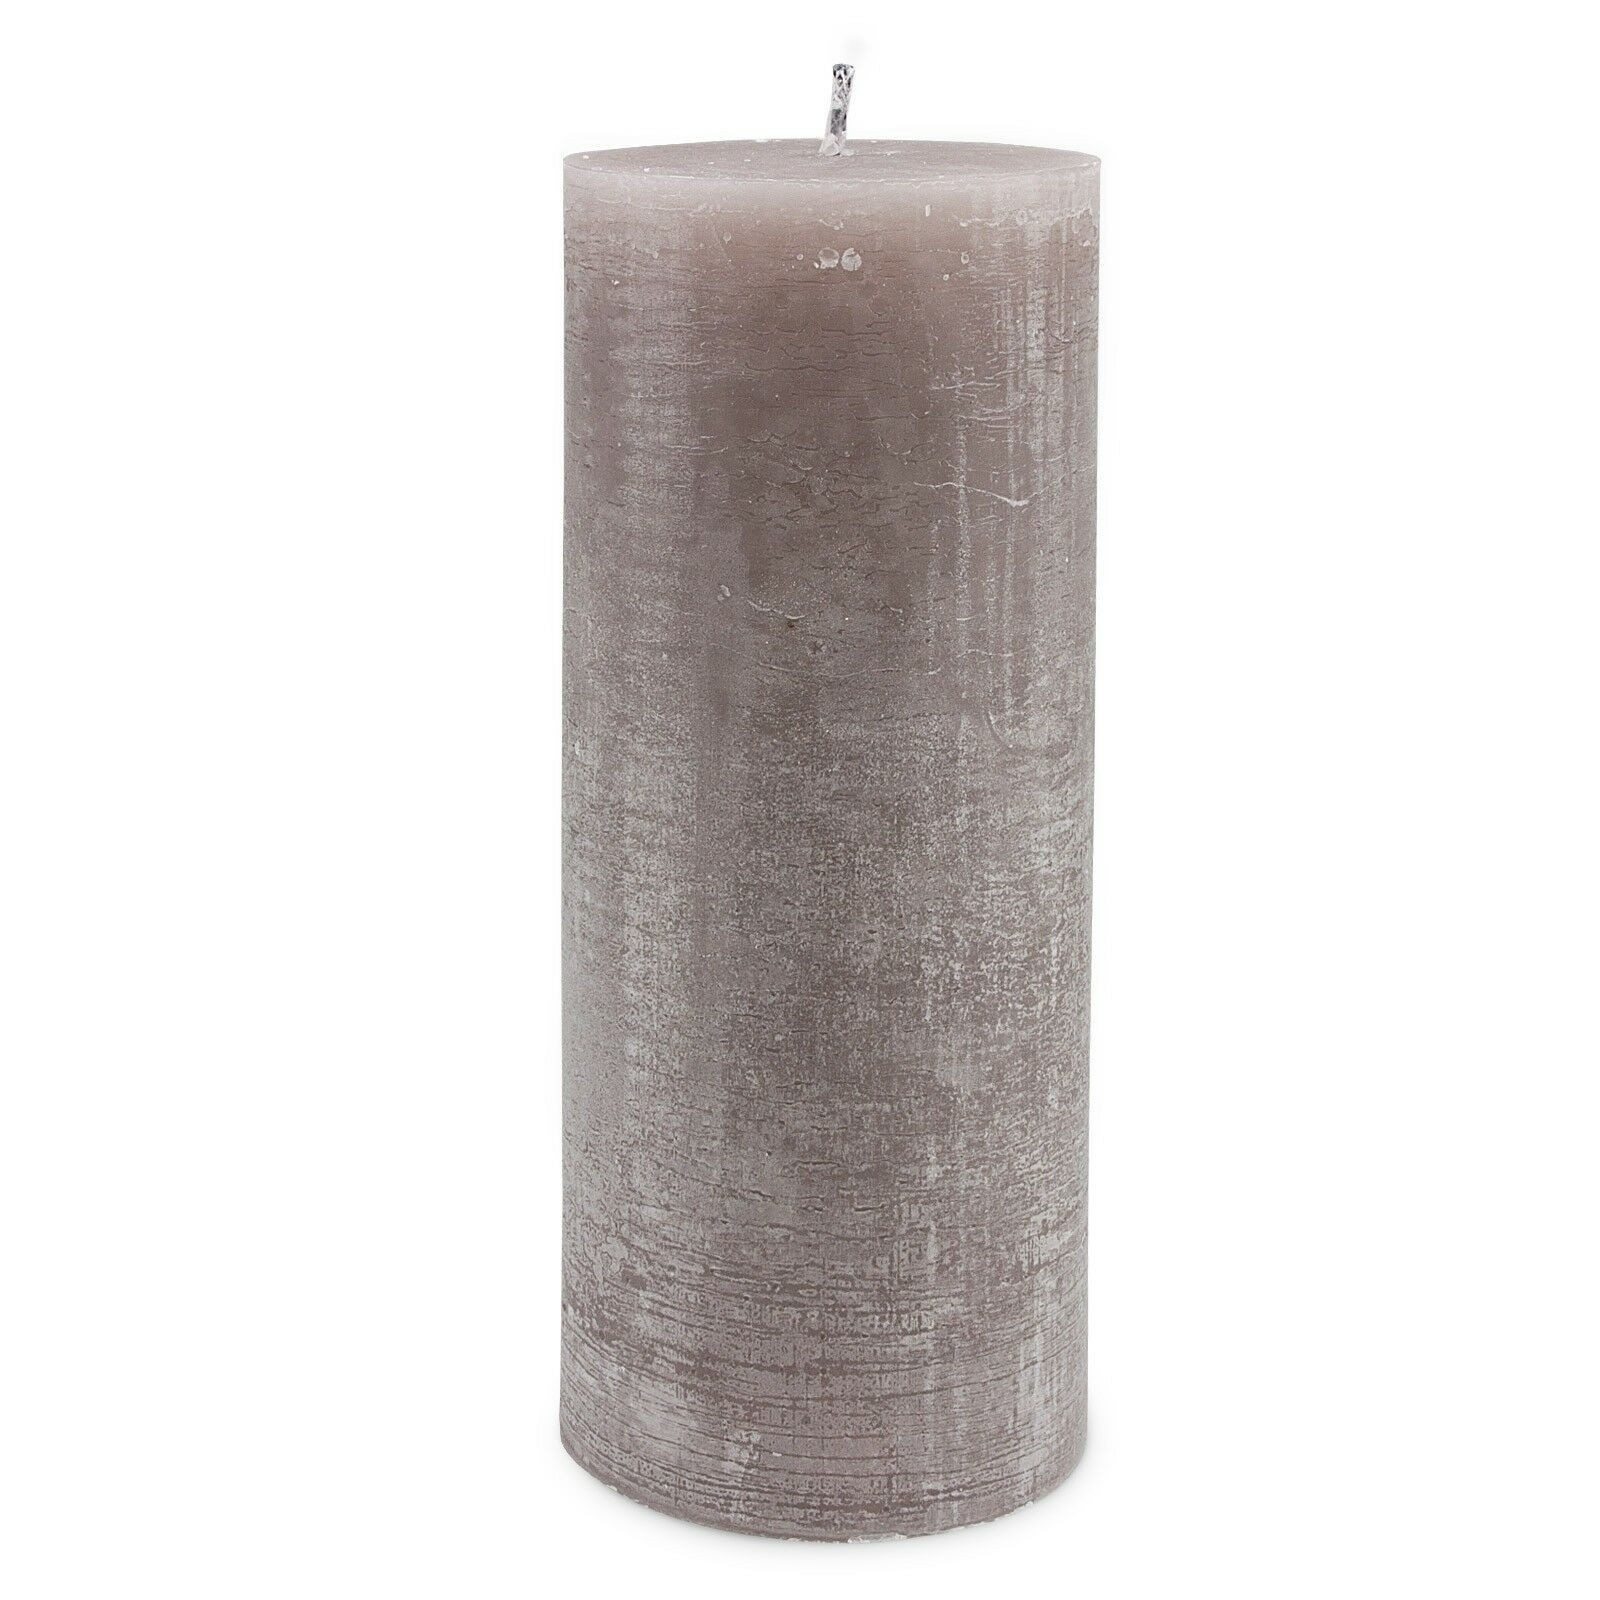 Stumpen Outdoor Kerze Hell Grau Beige Ø 12     30 cm Durchgefärbt Garten | Jeder beschriebene Artikel ist verfügbar  a2cb96